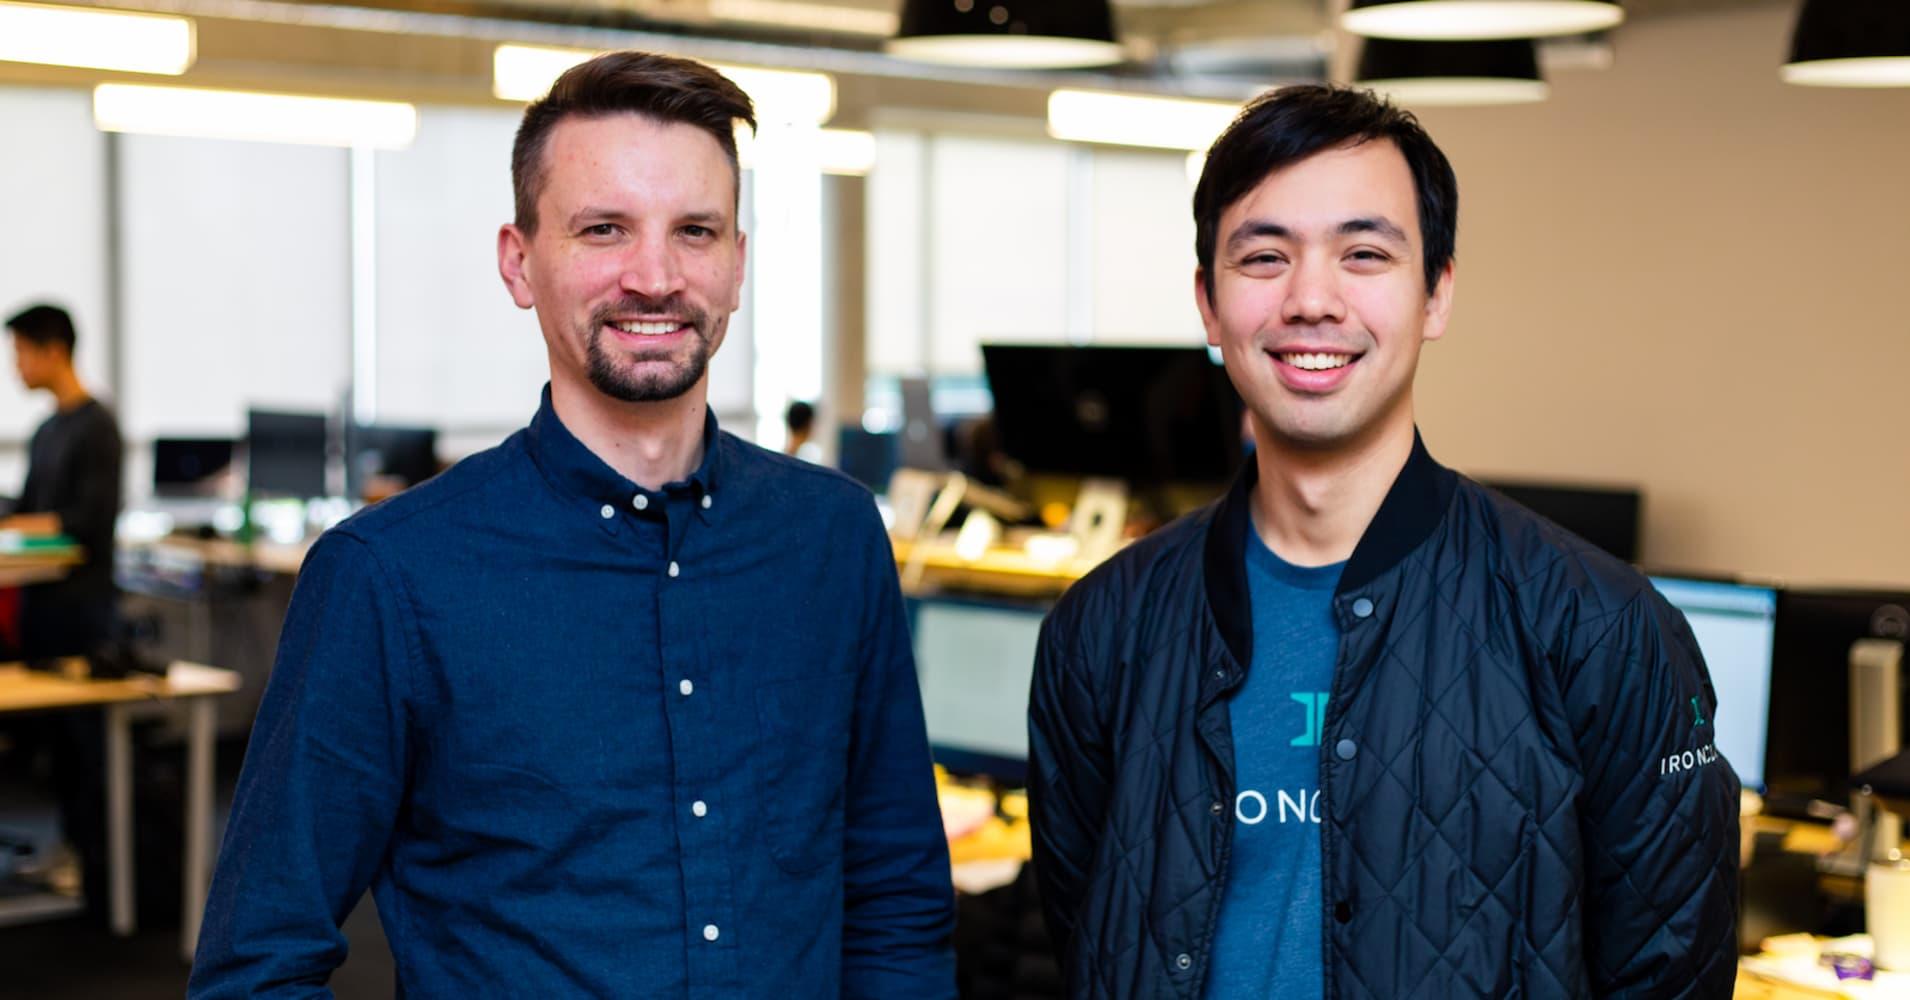 Ironclad co-founders Jason Boehmig, left, and Cai GoGwilt.